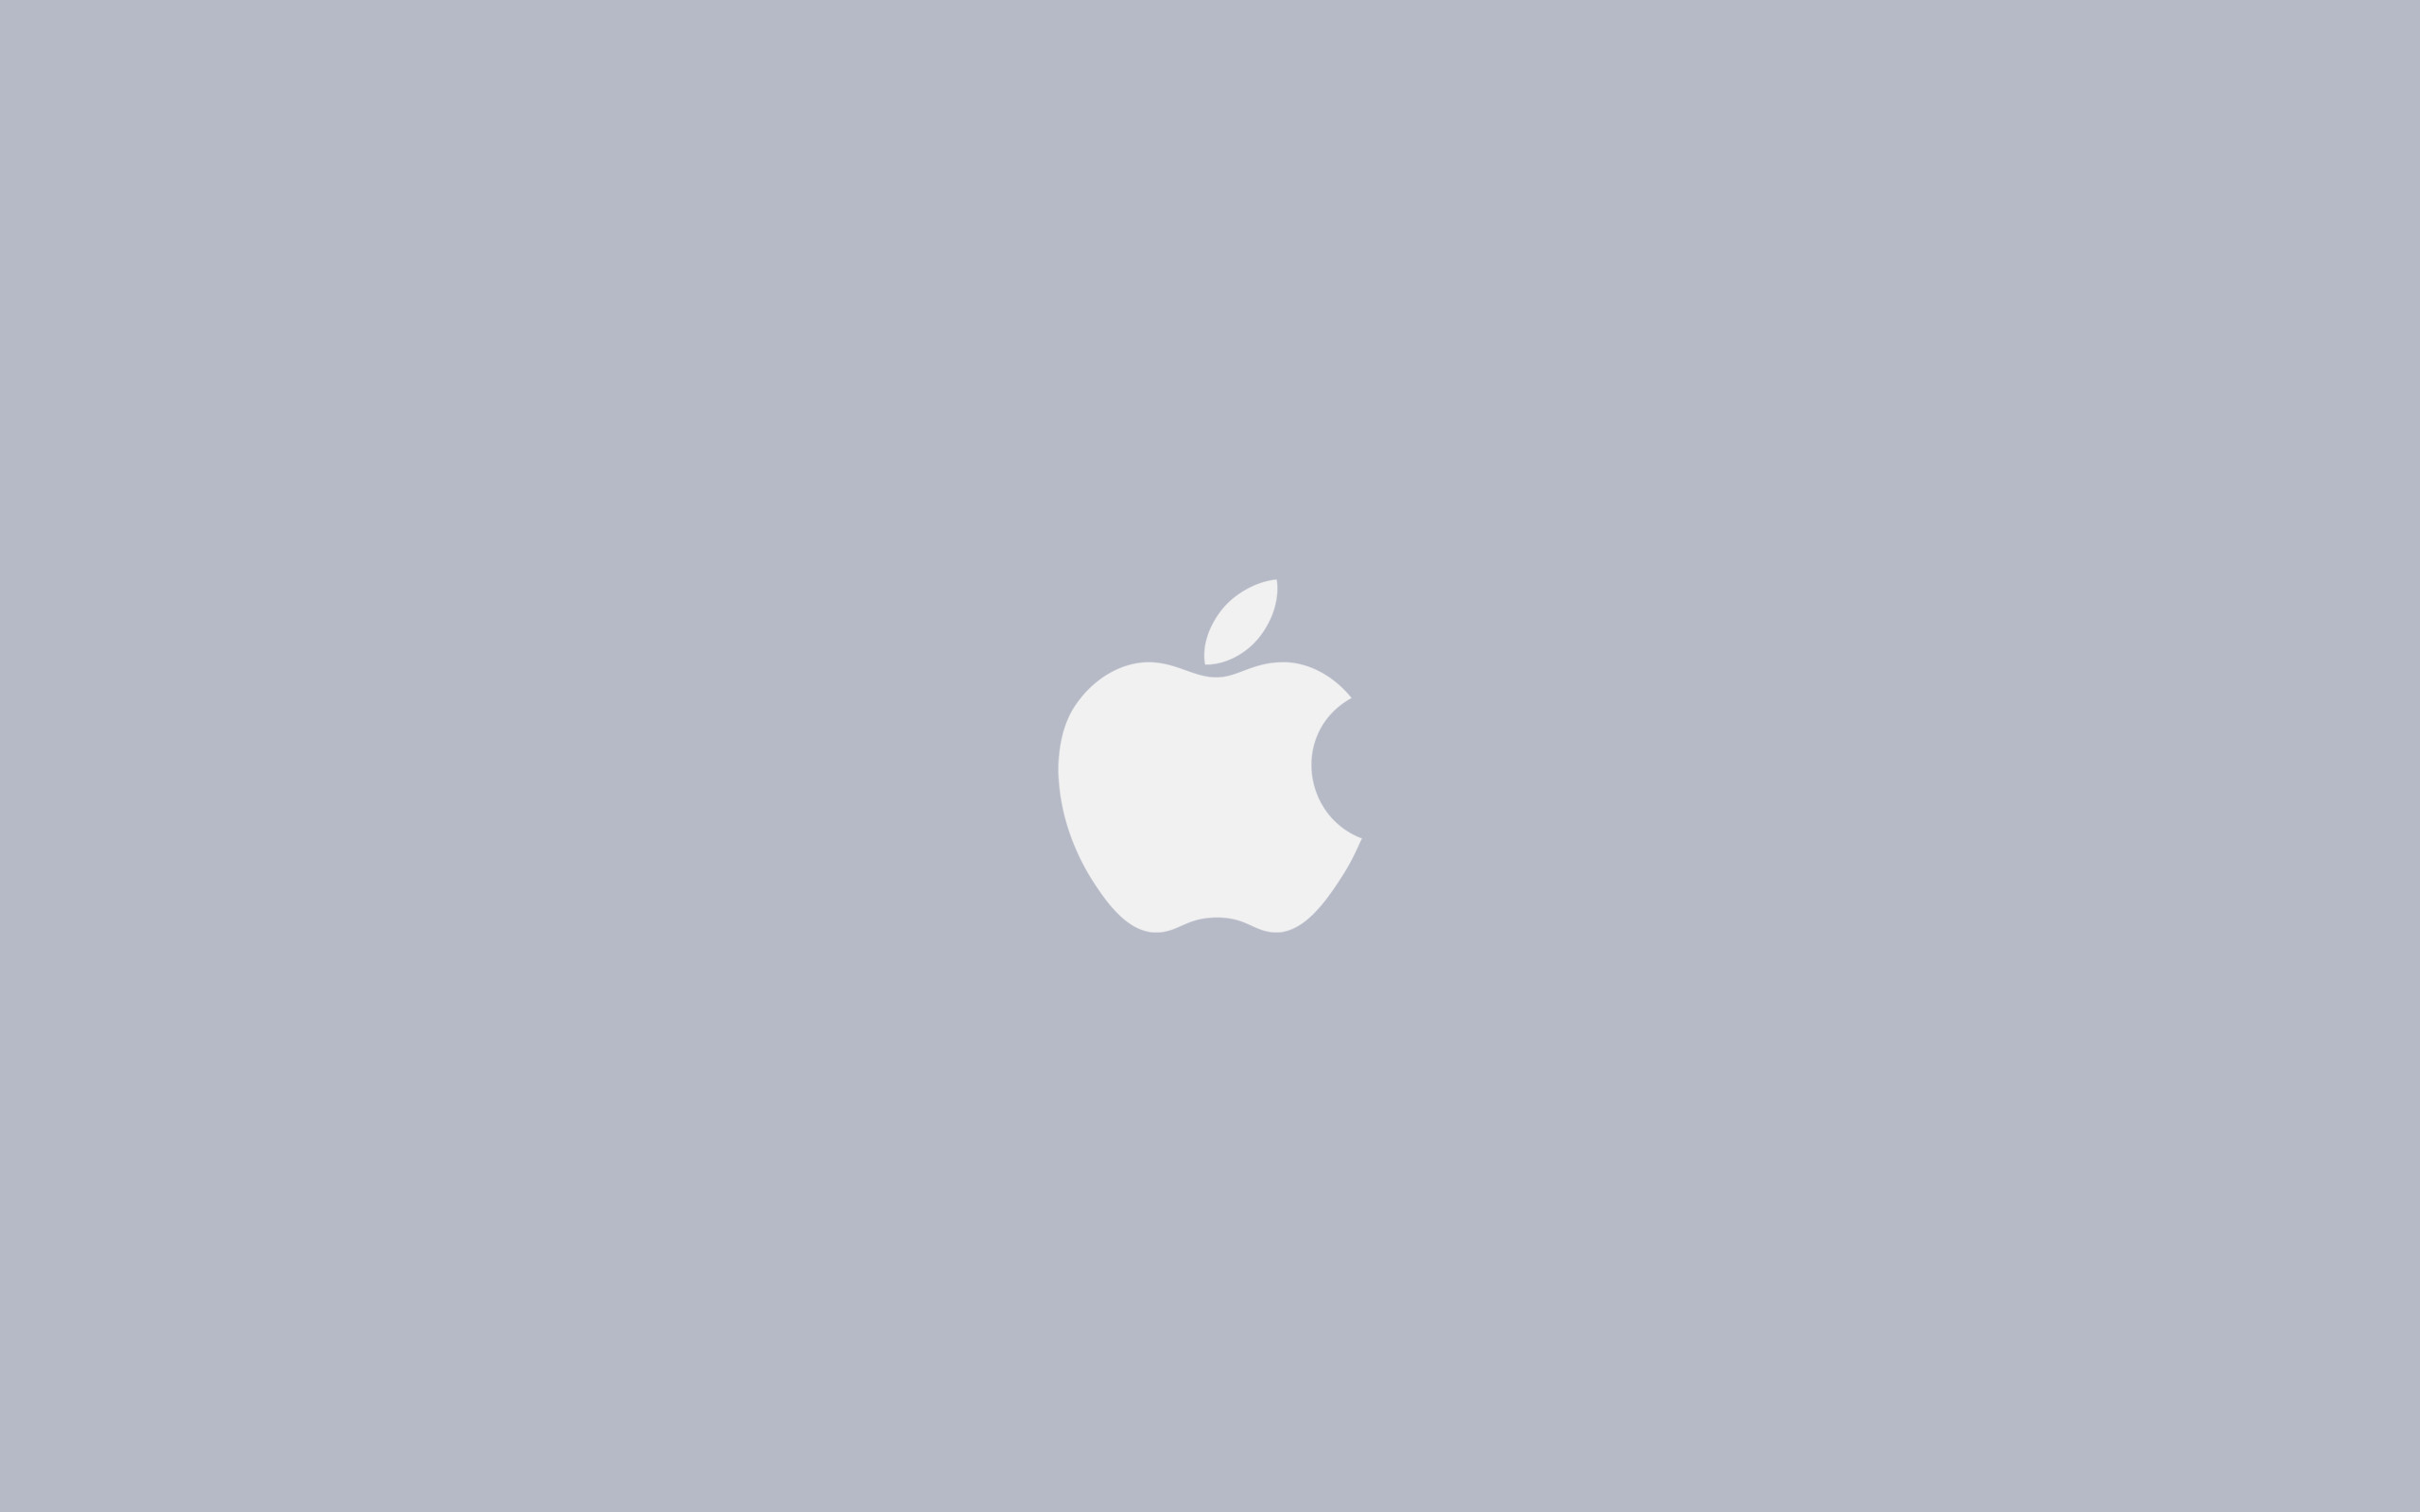 Silver Apple Logo Wallpaper Wallpapers Wallpapers Apple Store 2560x1600 Wallpaper Teahub Io